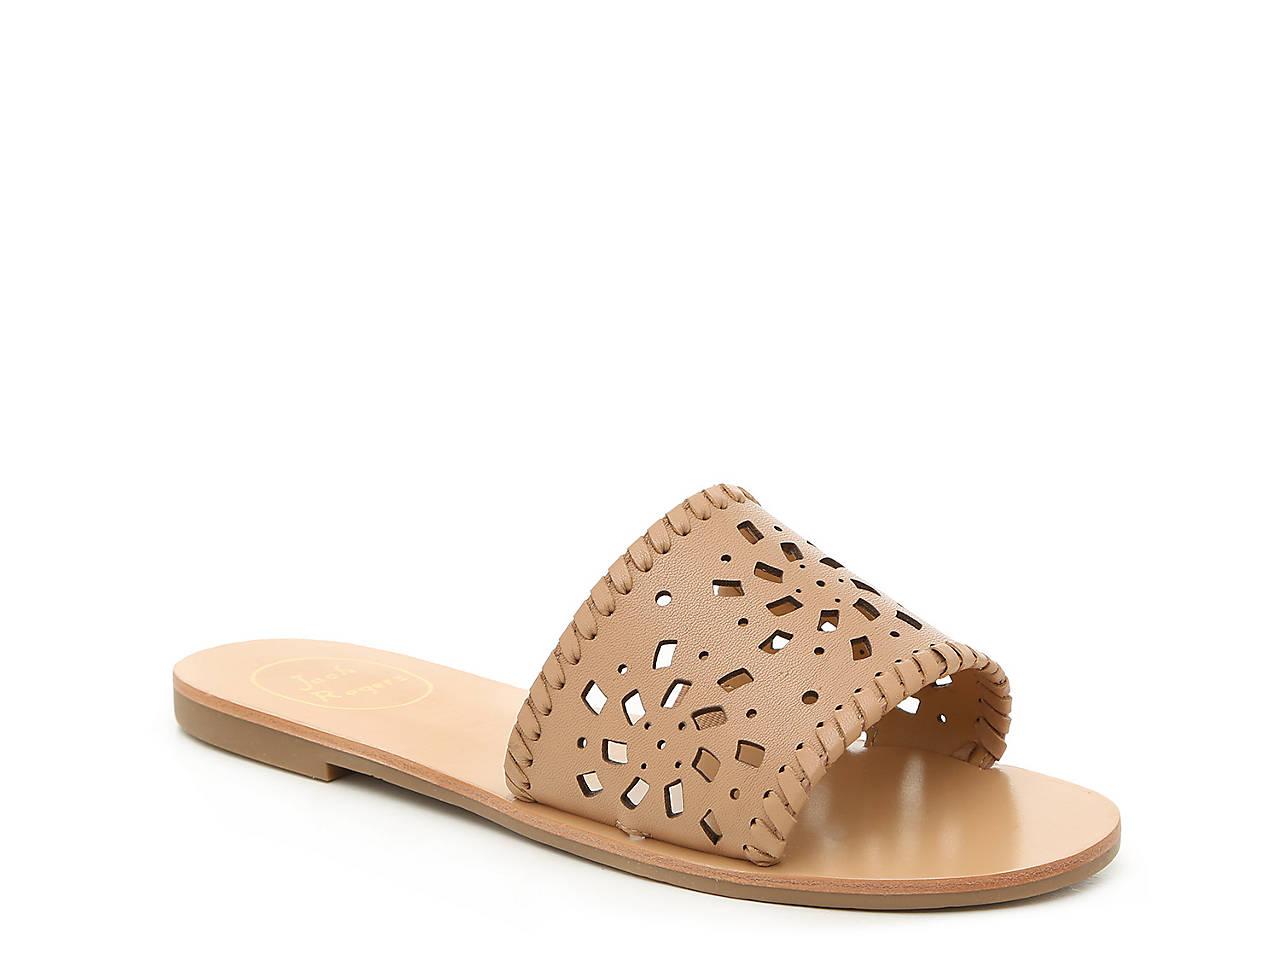 32ad3adf6ff Jack Rogers Delilah Sandal Women s Shoes